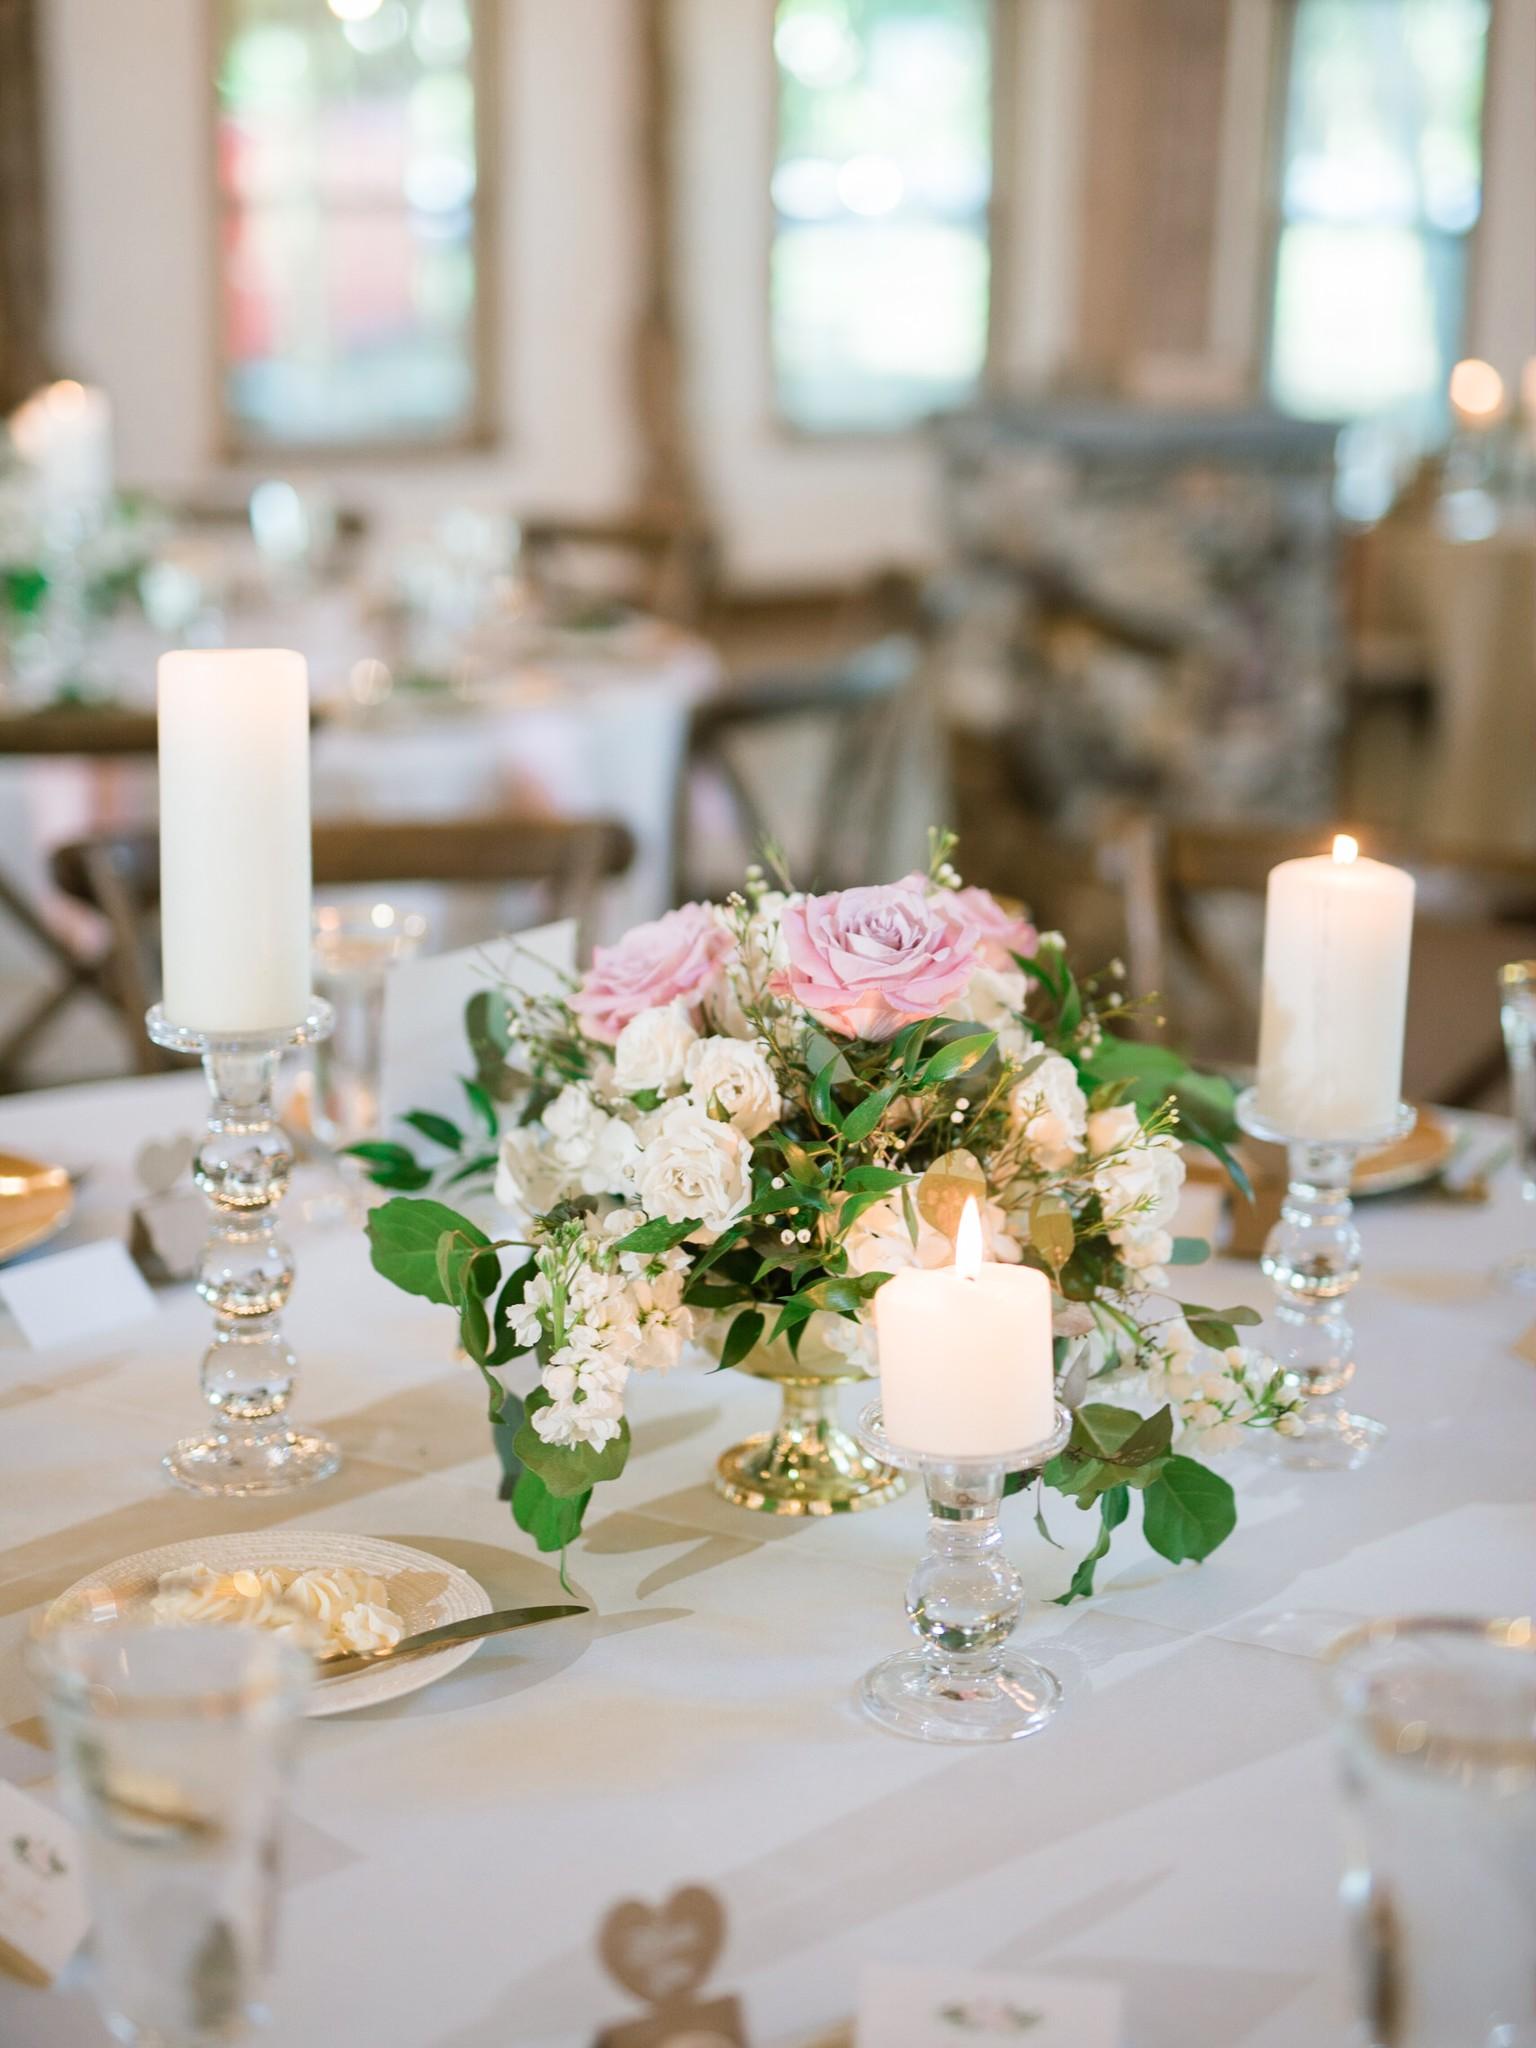 VA-Great-Marsh-Estate-Summer-Wedding-Blush-86.jpg